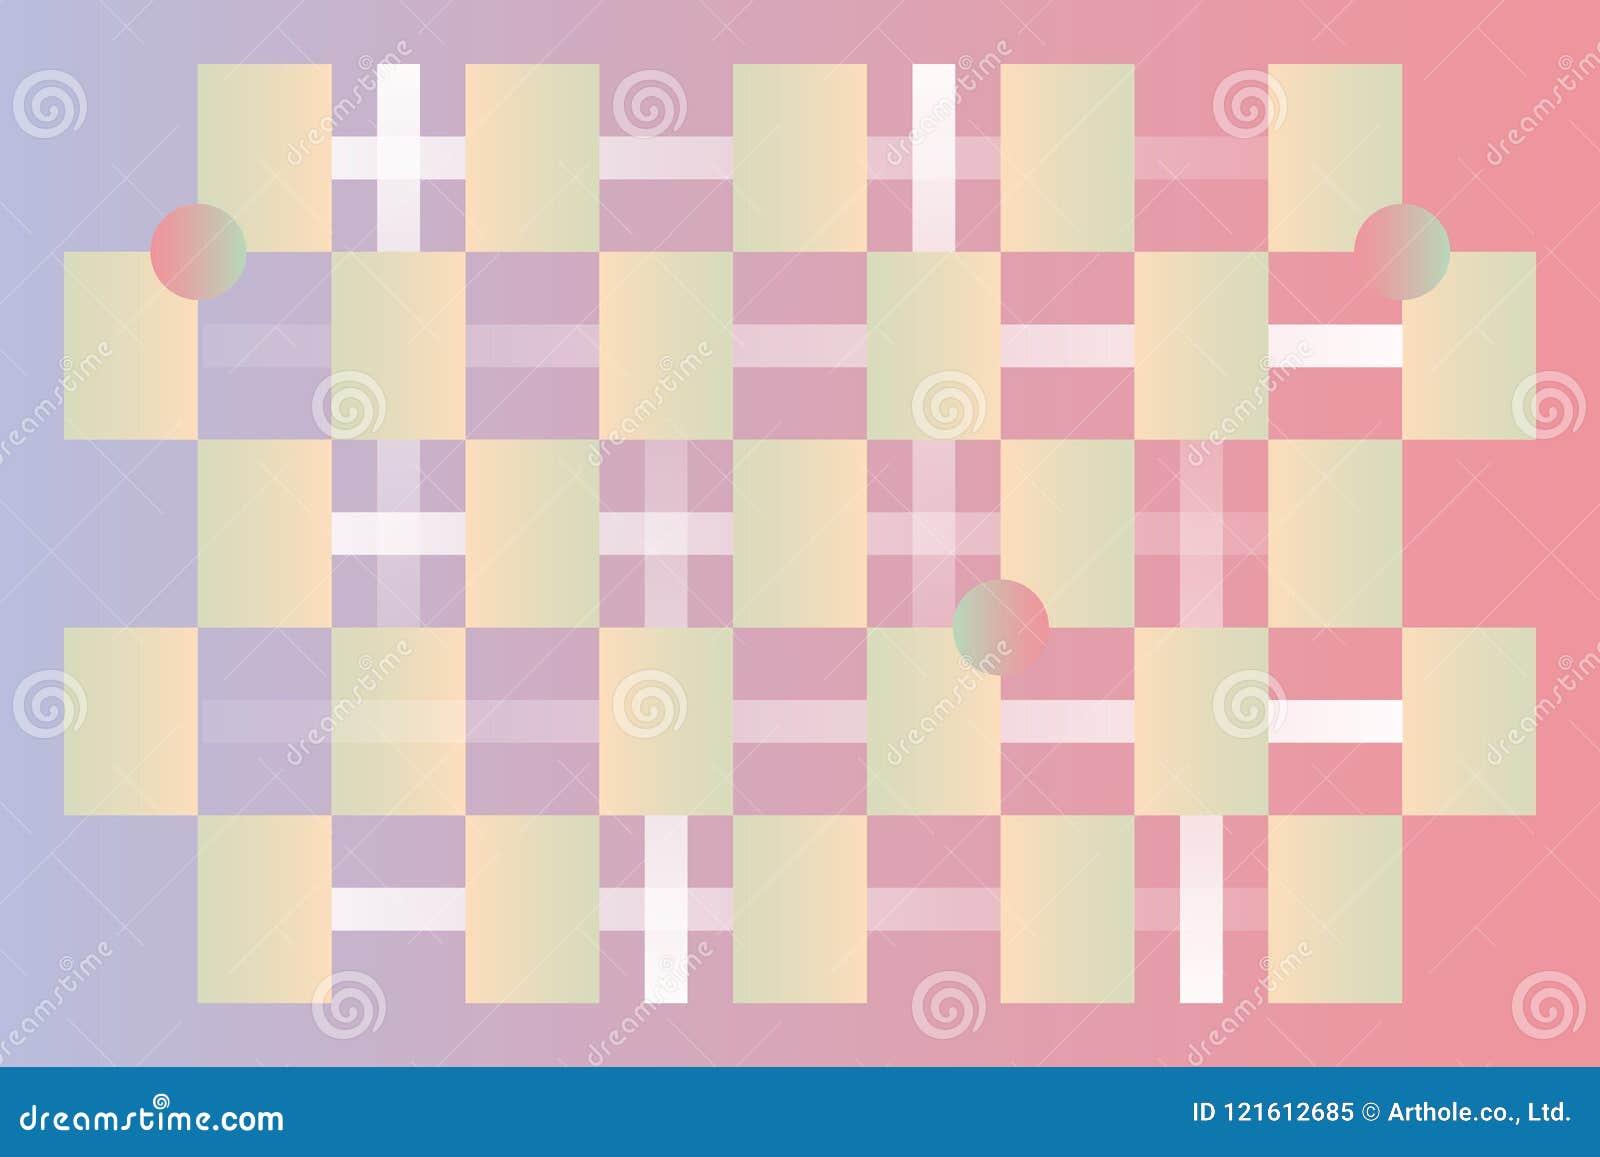 Trandy color pattern background